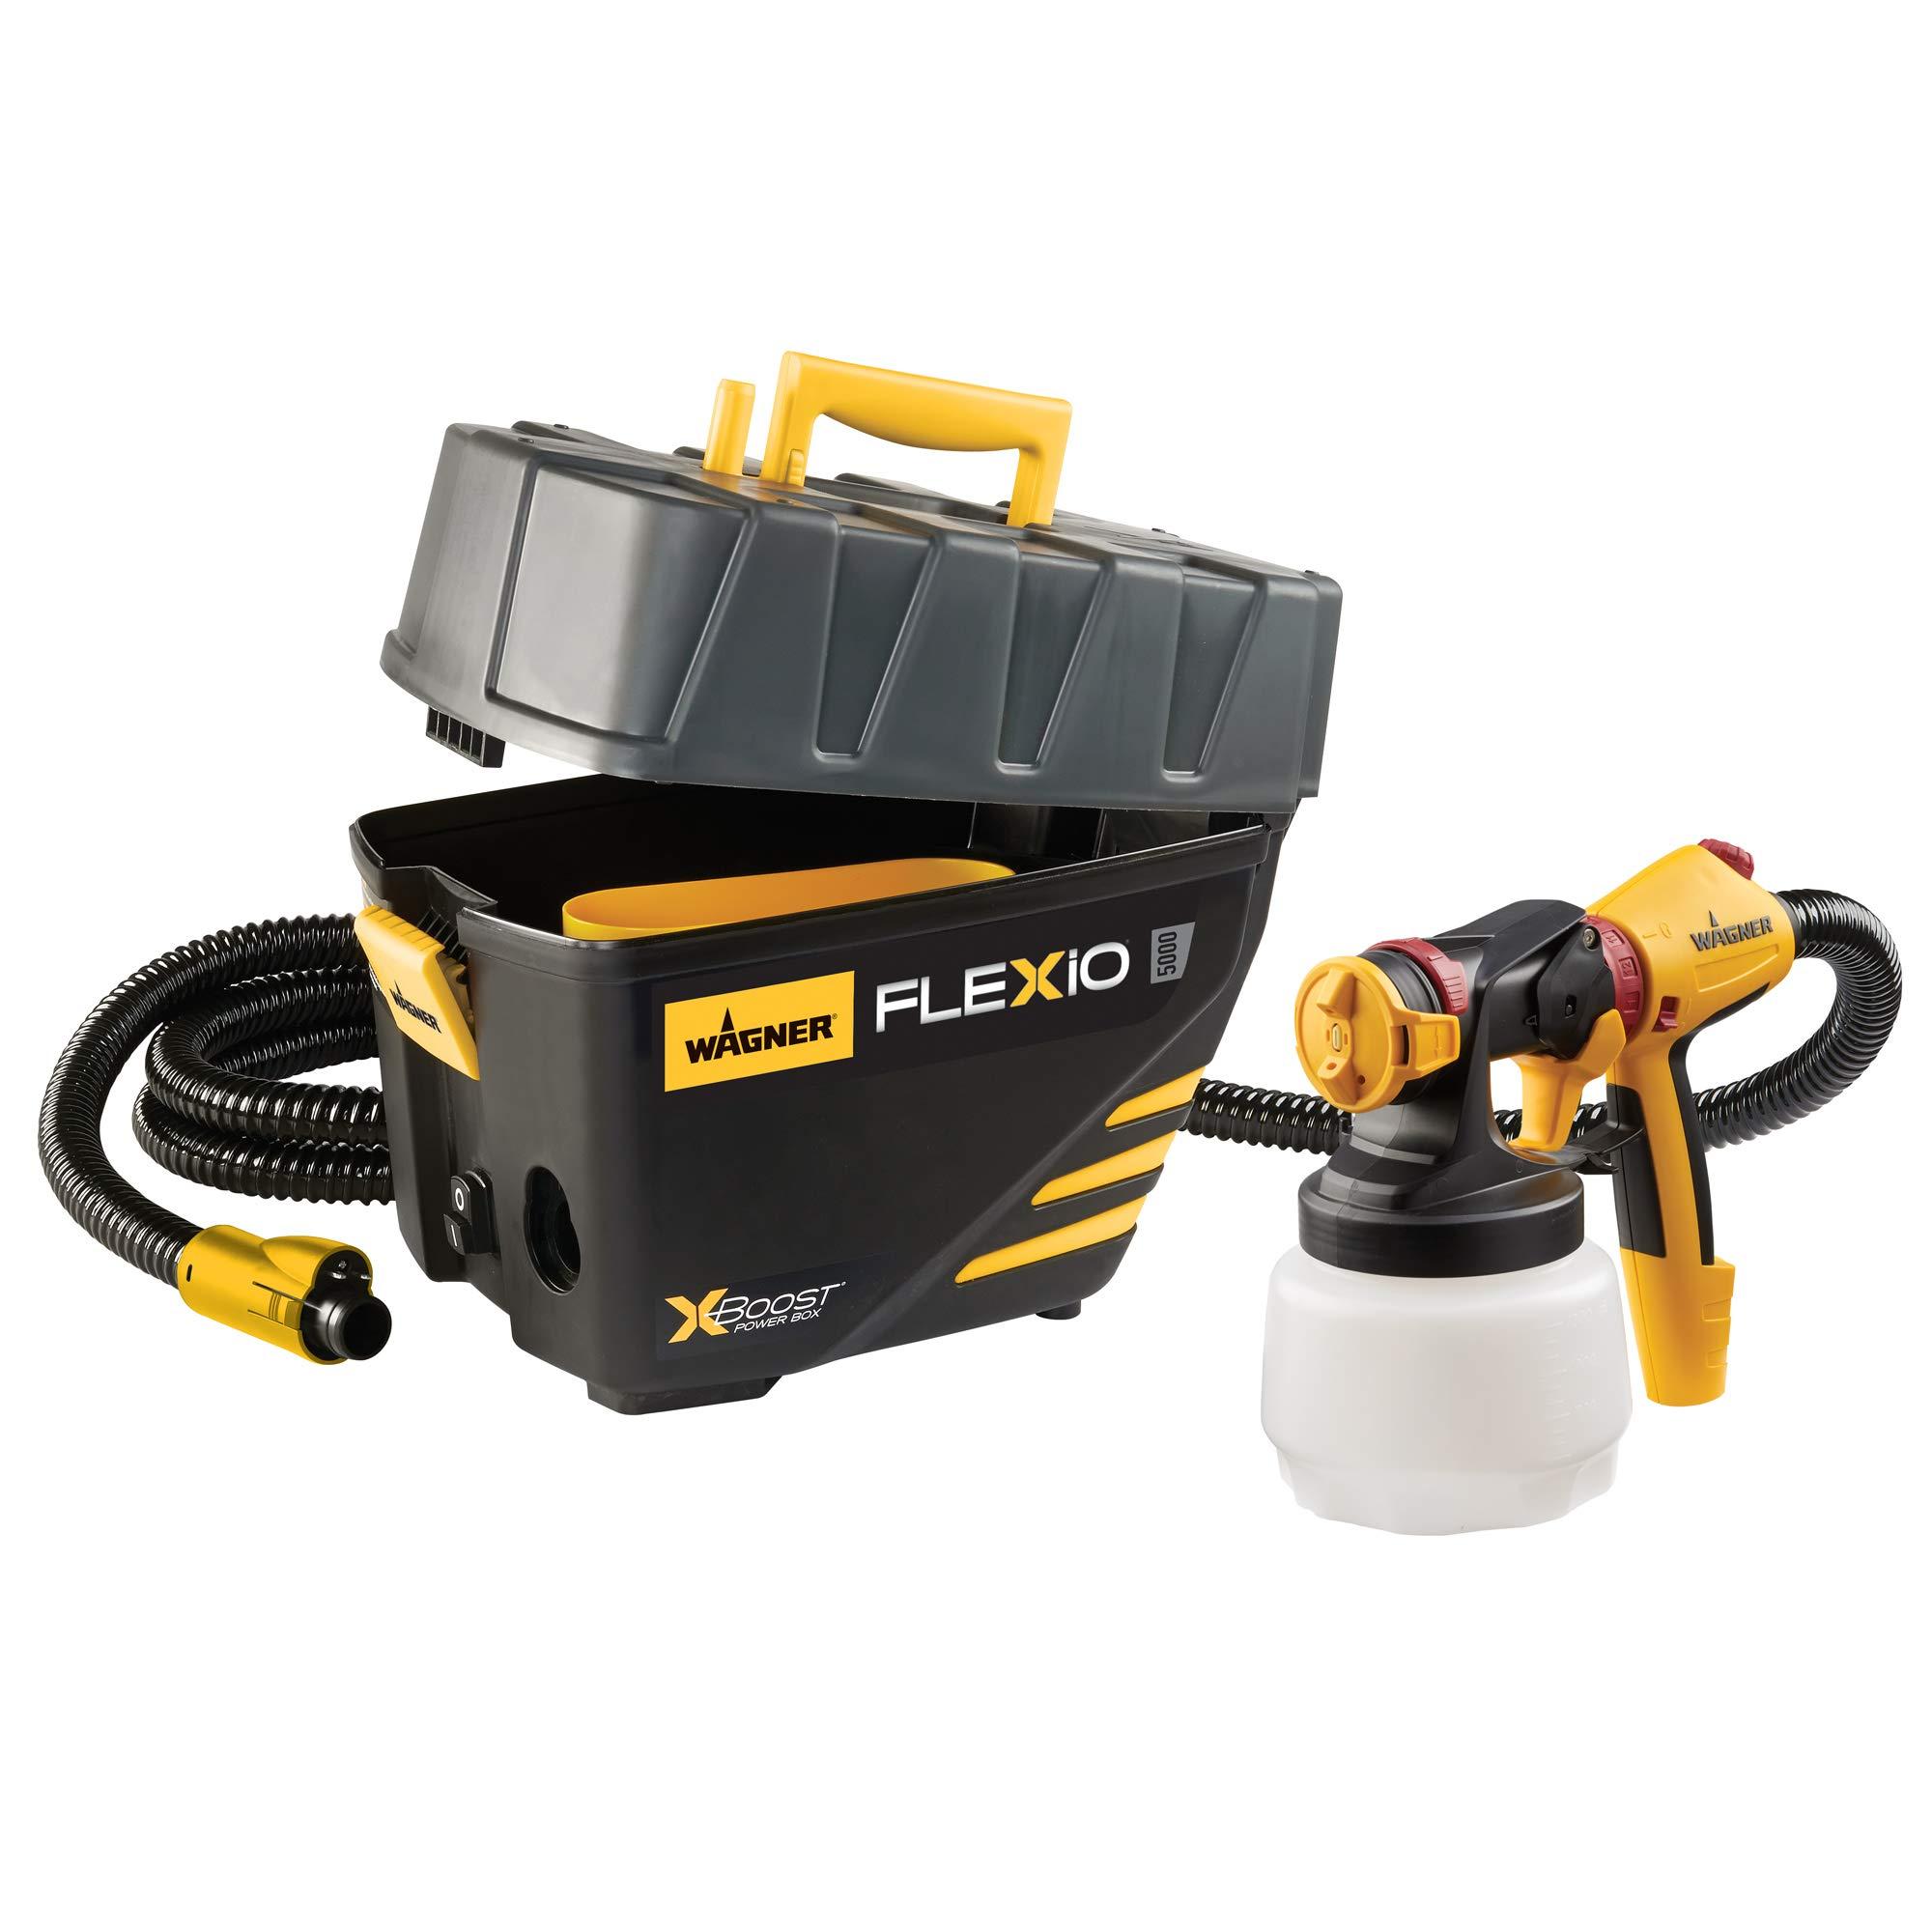 Wagner Spraytech 0529091 FLEXiO 5000 HVLP Paint Sprayer, Yellow, Black